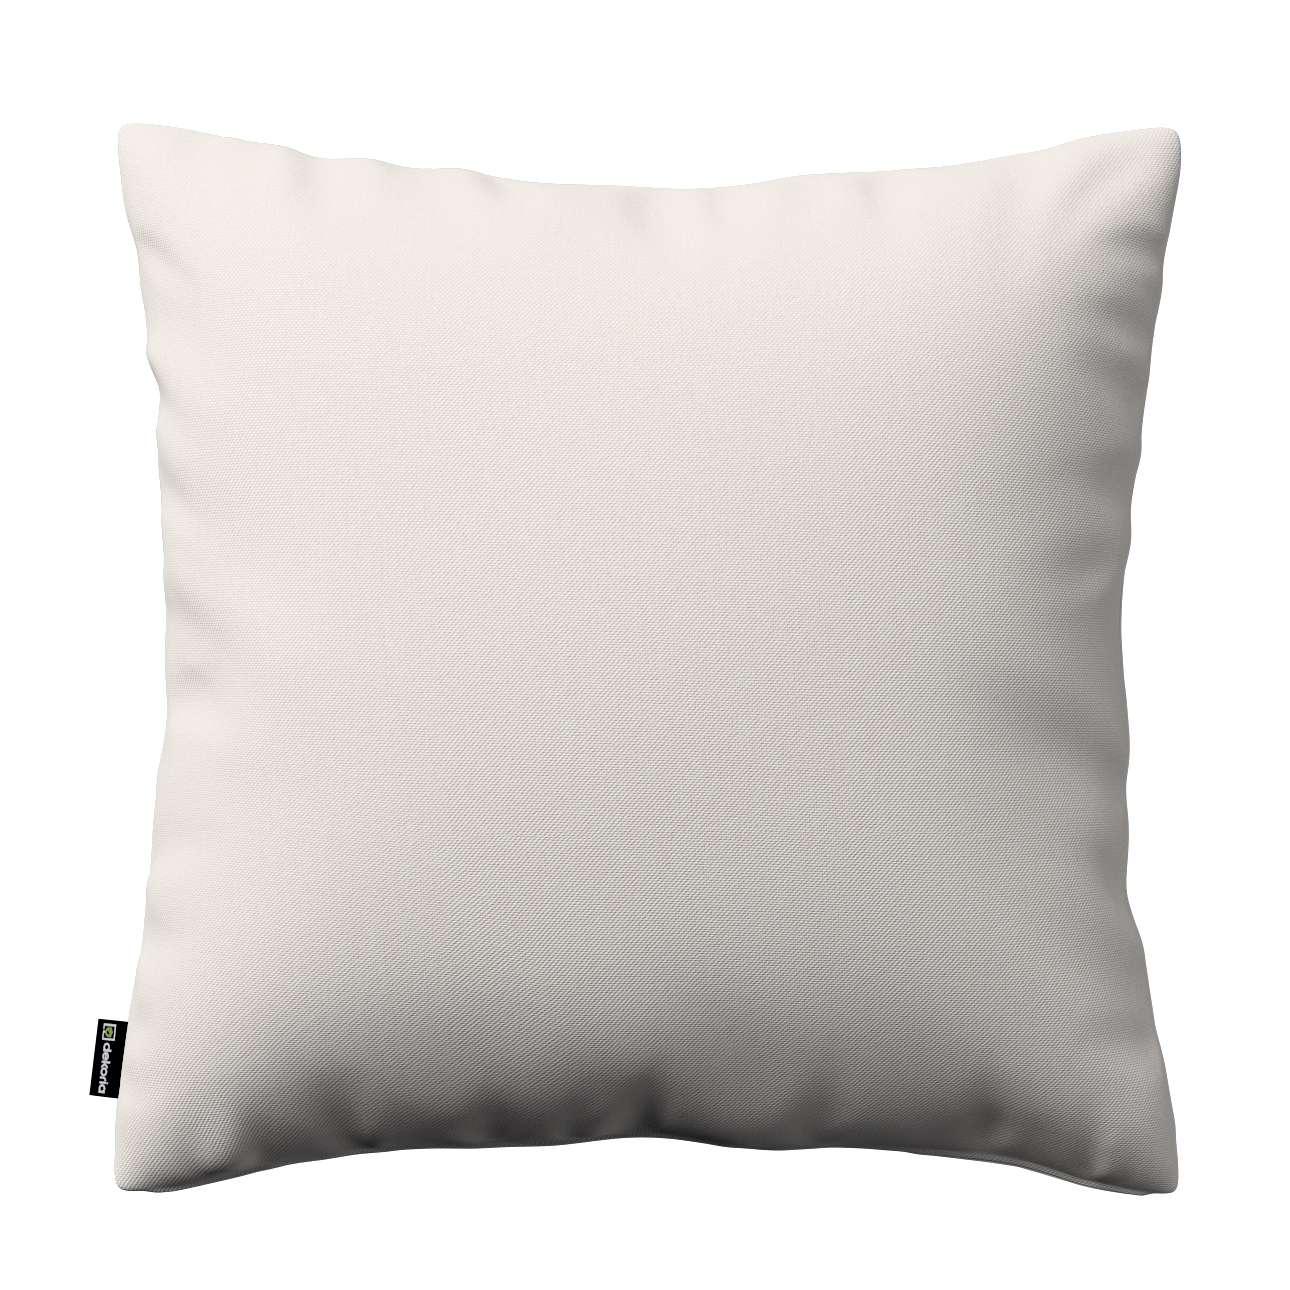 Kuddfodral standard i kollektionen Etna, Tyg: 705-01